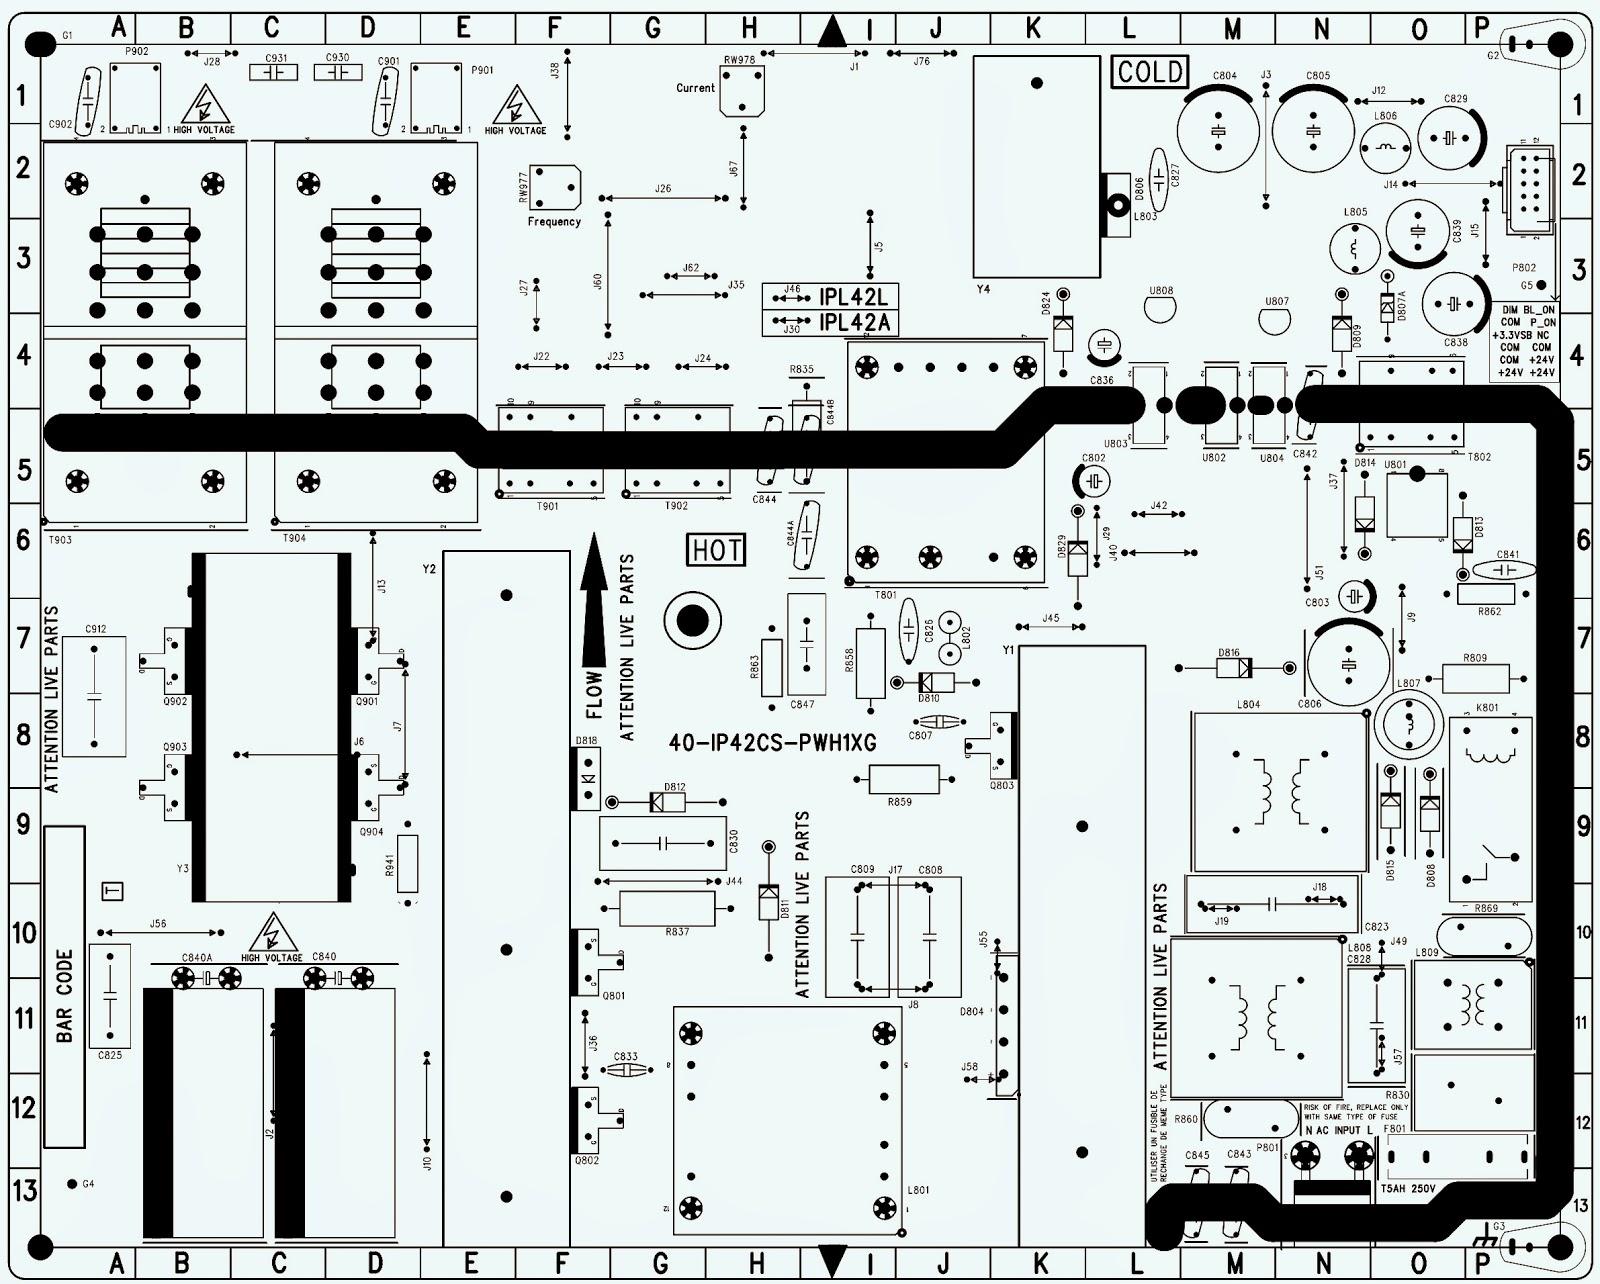 Power Supply Troubleshooting | Wiring Diagram Database